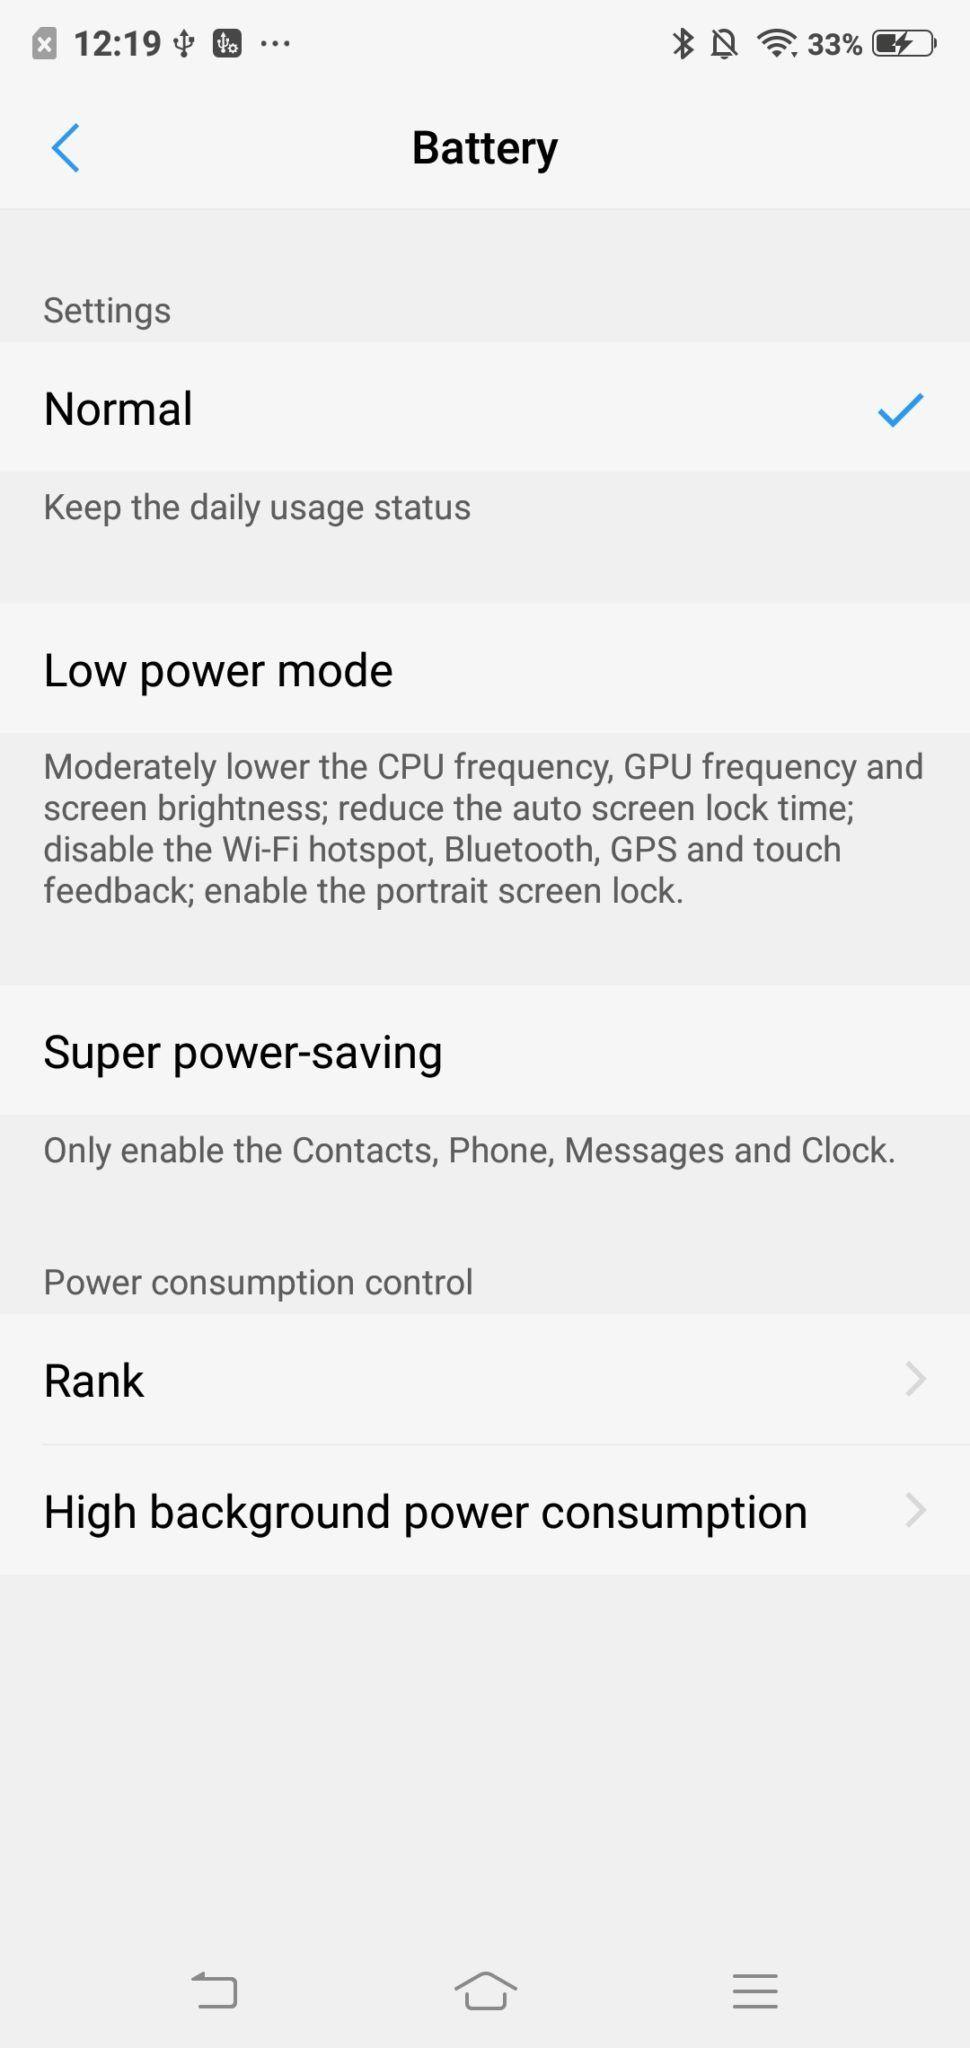 Vivo V9 battery 3